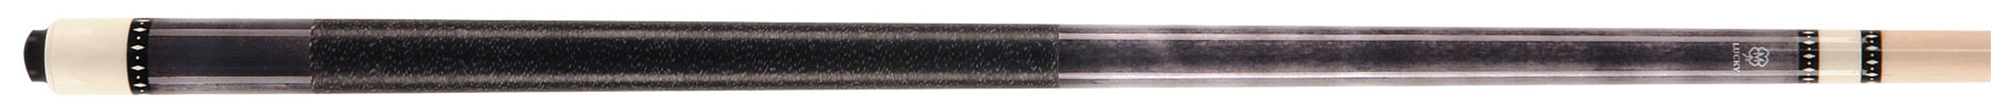 PK3071-8: Lucky L8 Grey with Irish Linen handle by McDermott #1